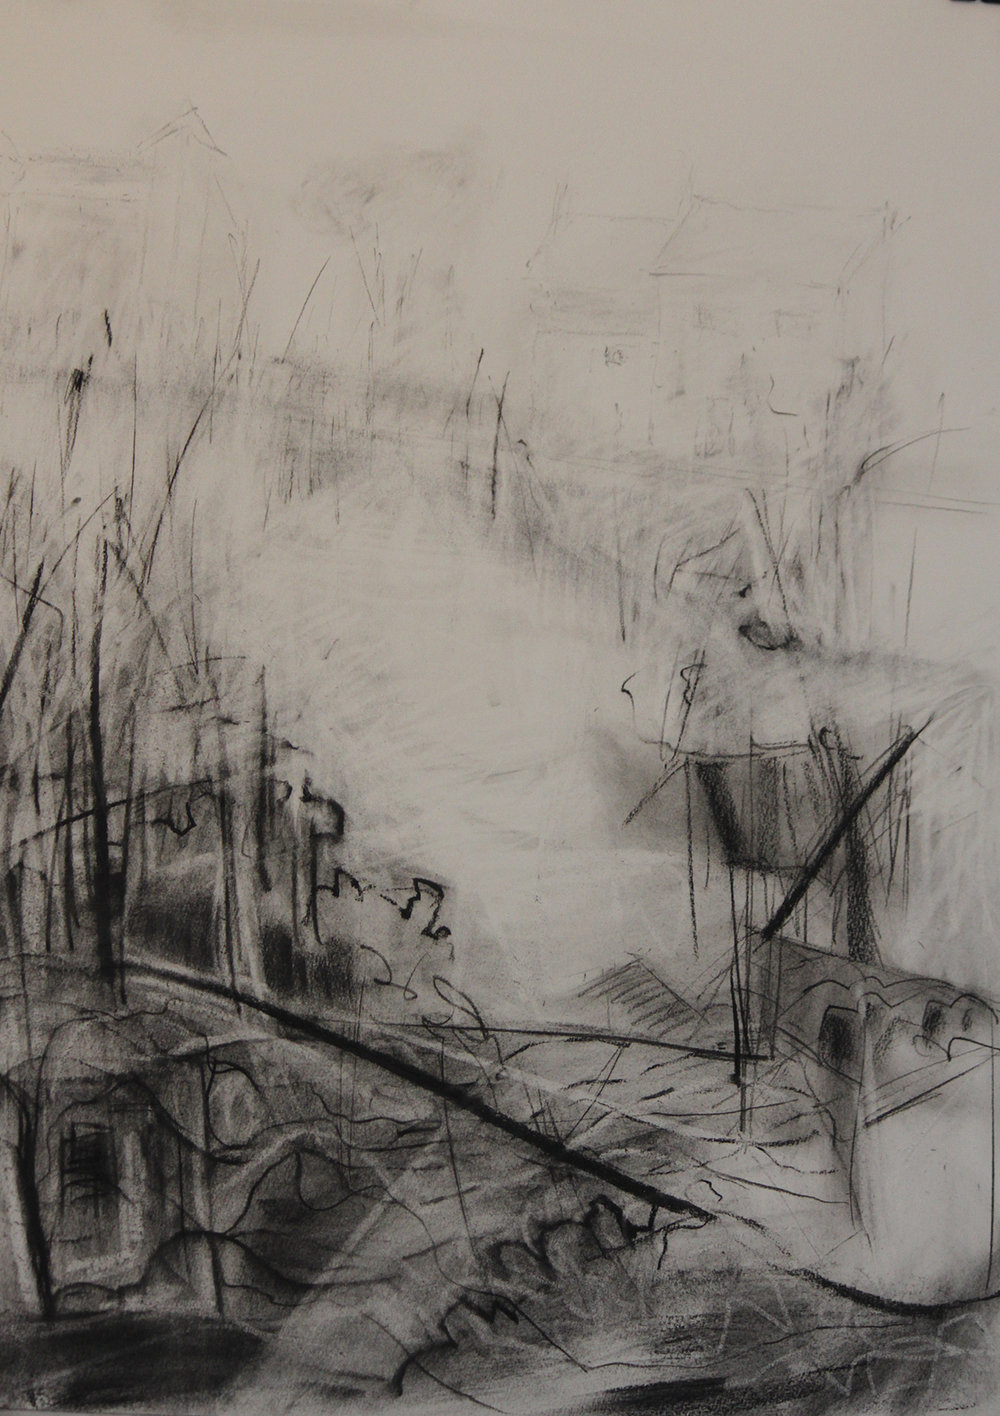 TITLE: Bleak edge of winter 3  MEDIUM:Charcoal, graphite on paper DIMENSIONS: H76 x W53cm